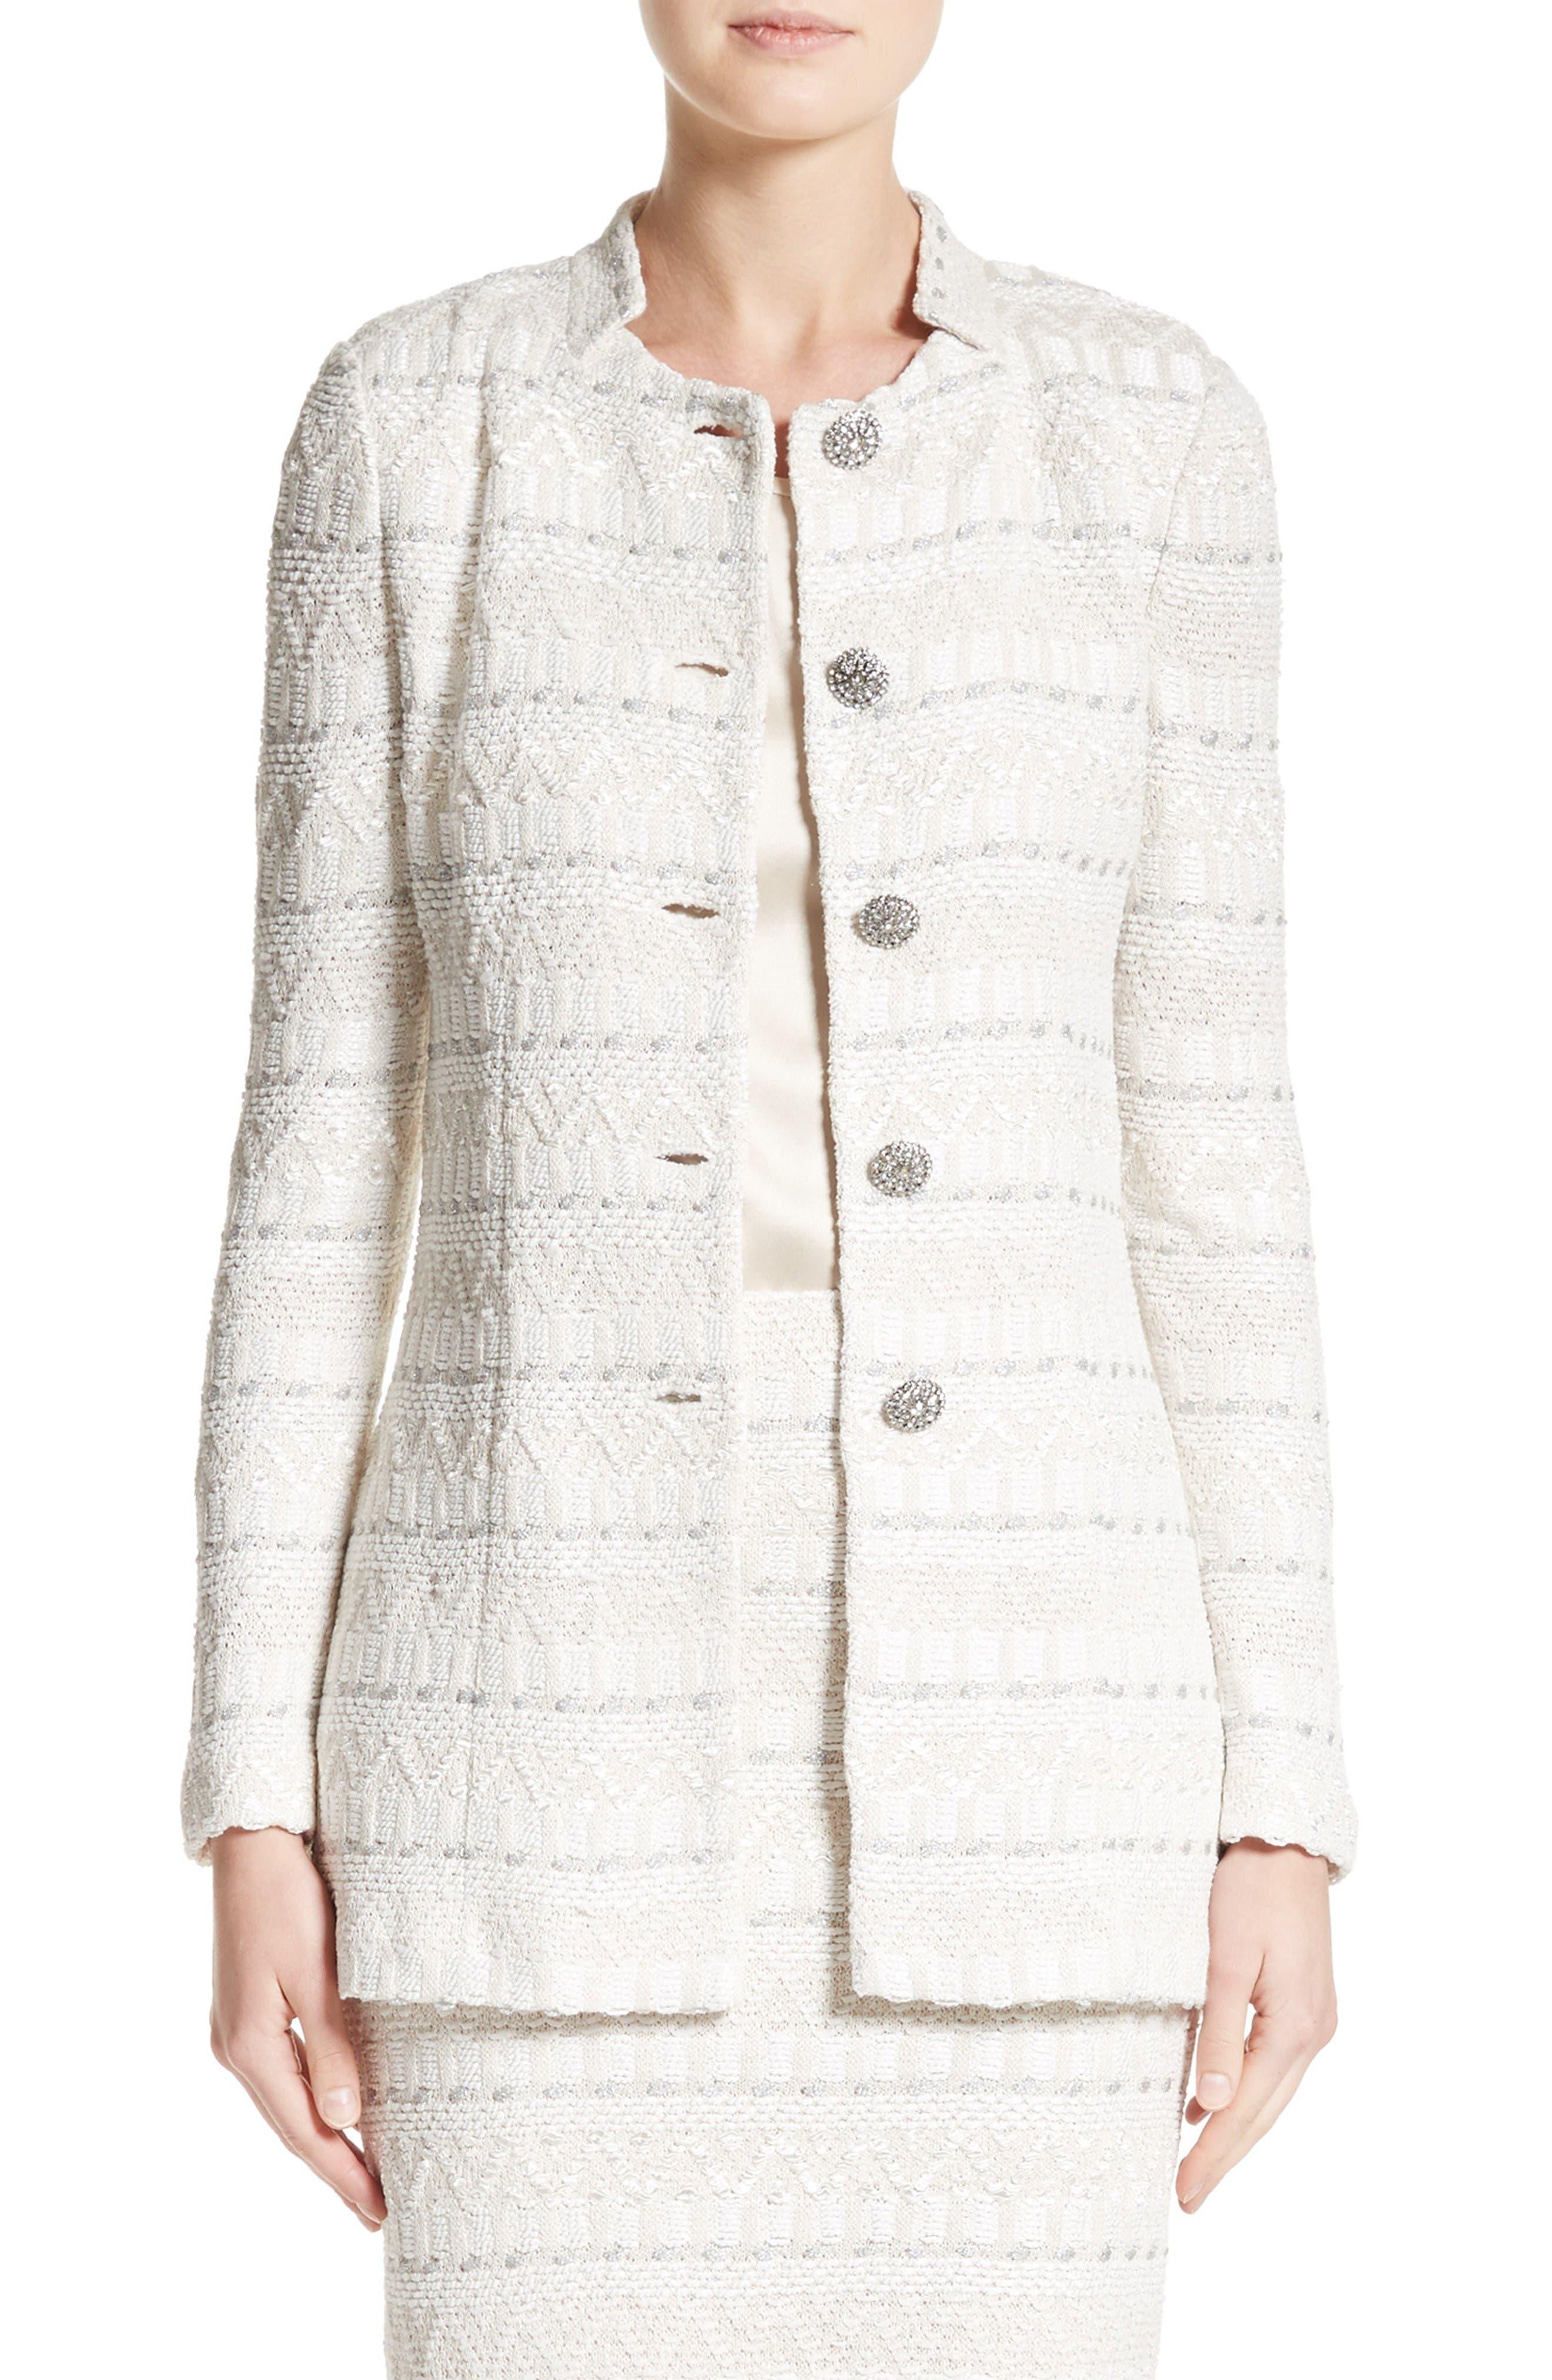 Main Image - St. John Collection Samar Knit Tweed Jacket